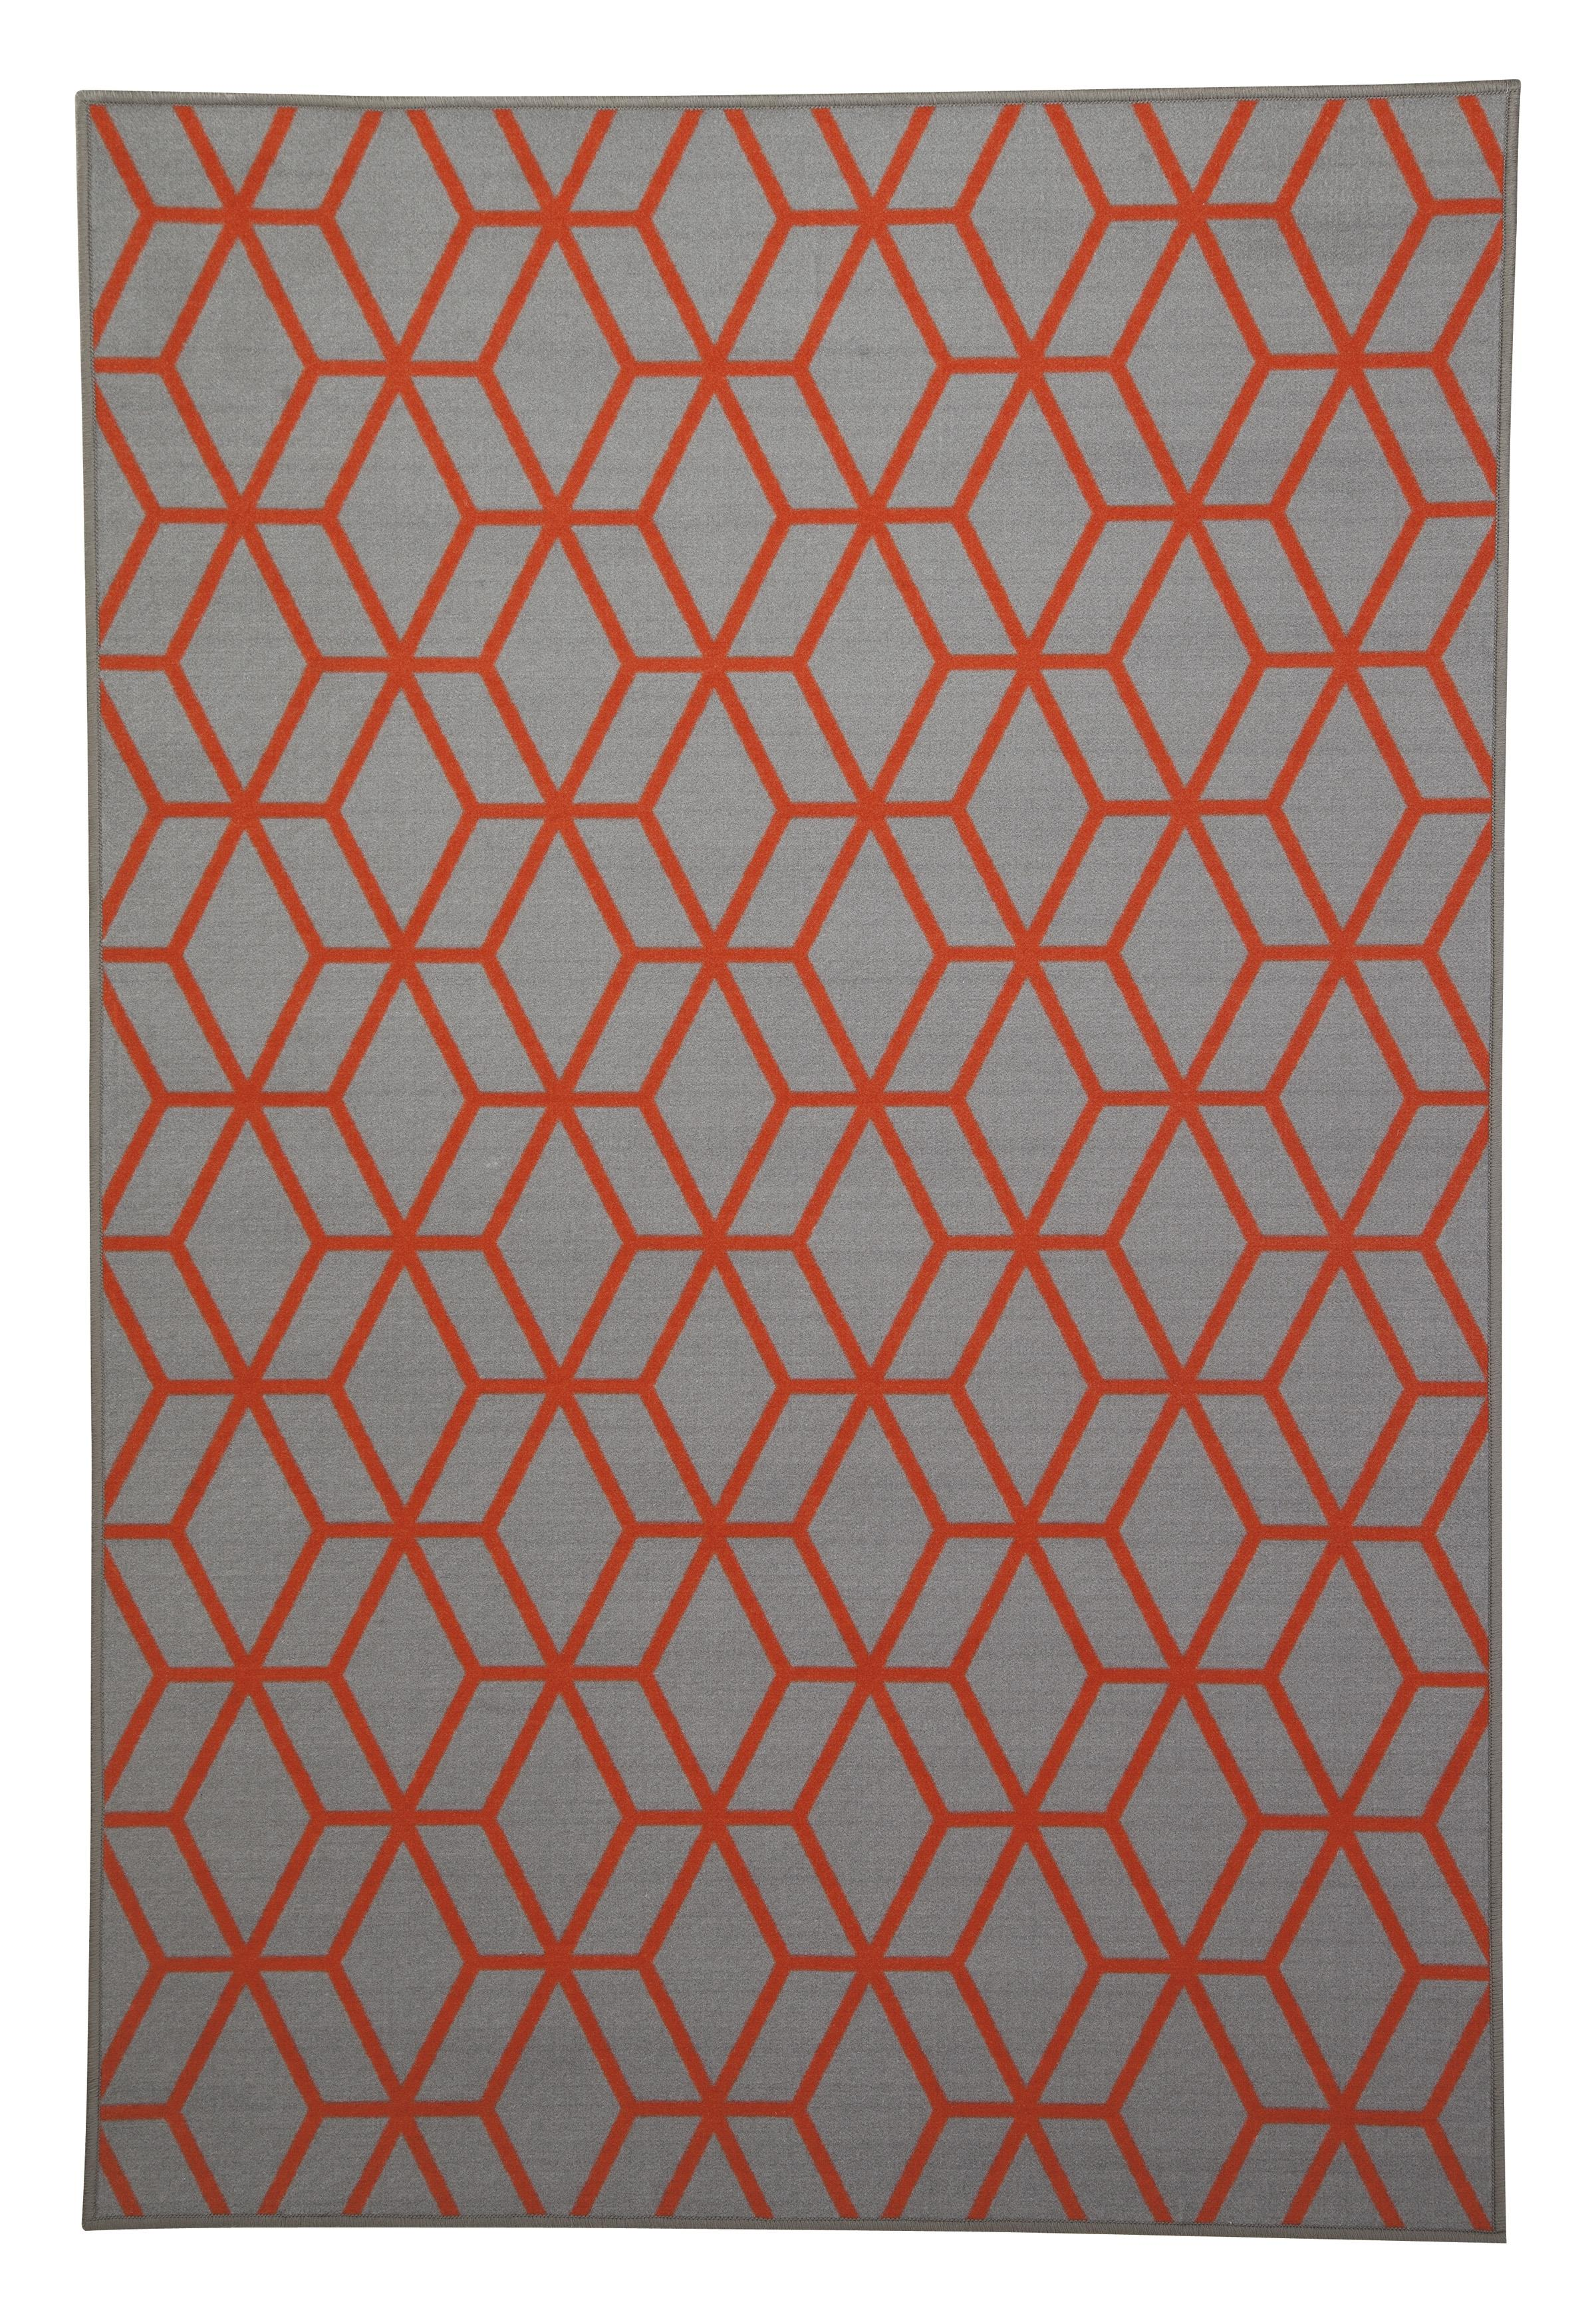 Signature Design by Ashley Transitional Area Rugs Rico Orange Medium Rug - Item Number: R331002